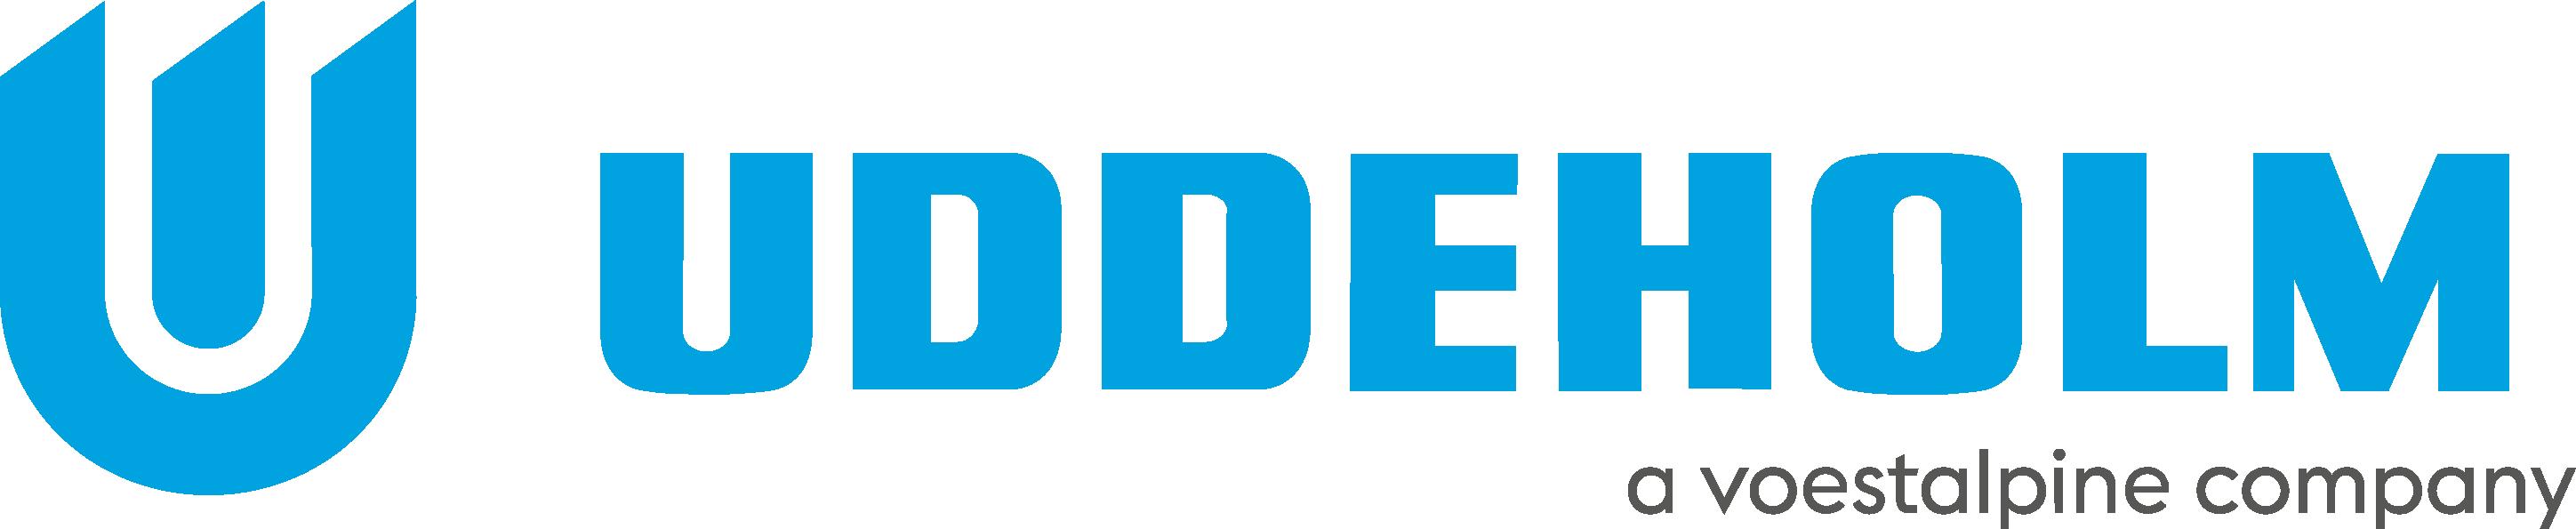 Uddeholm: a voestalpine company logo